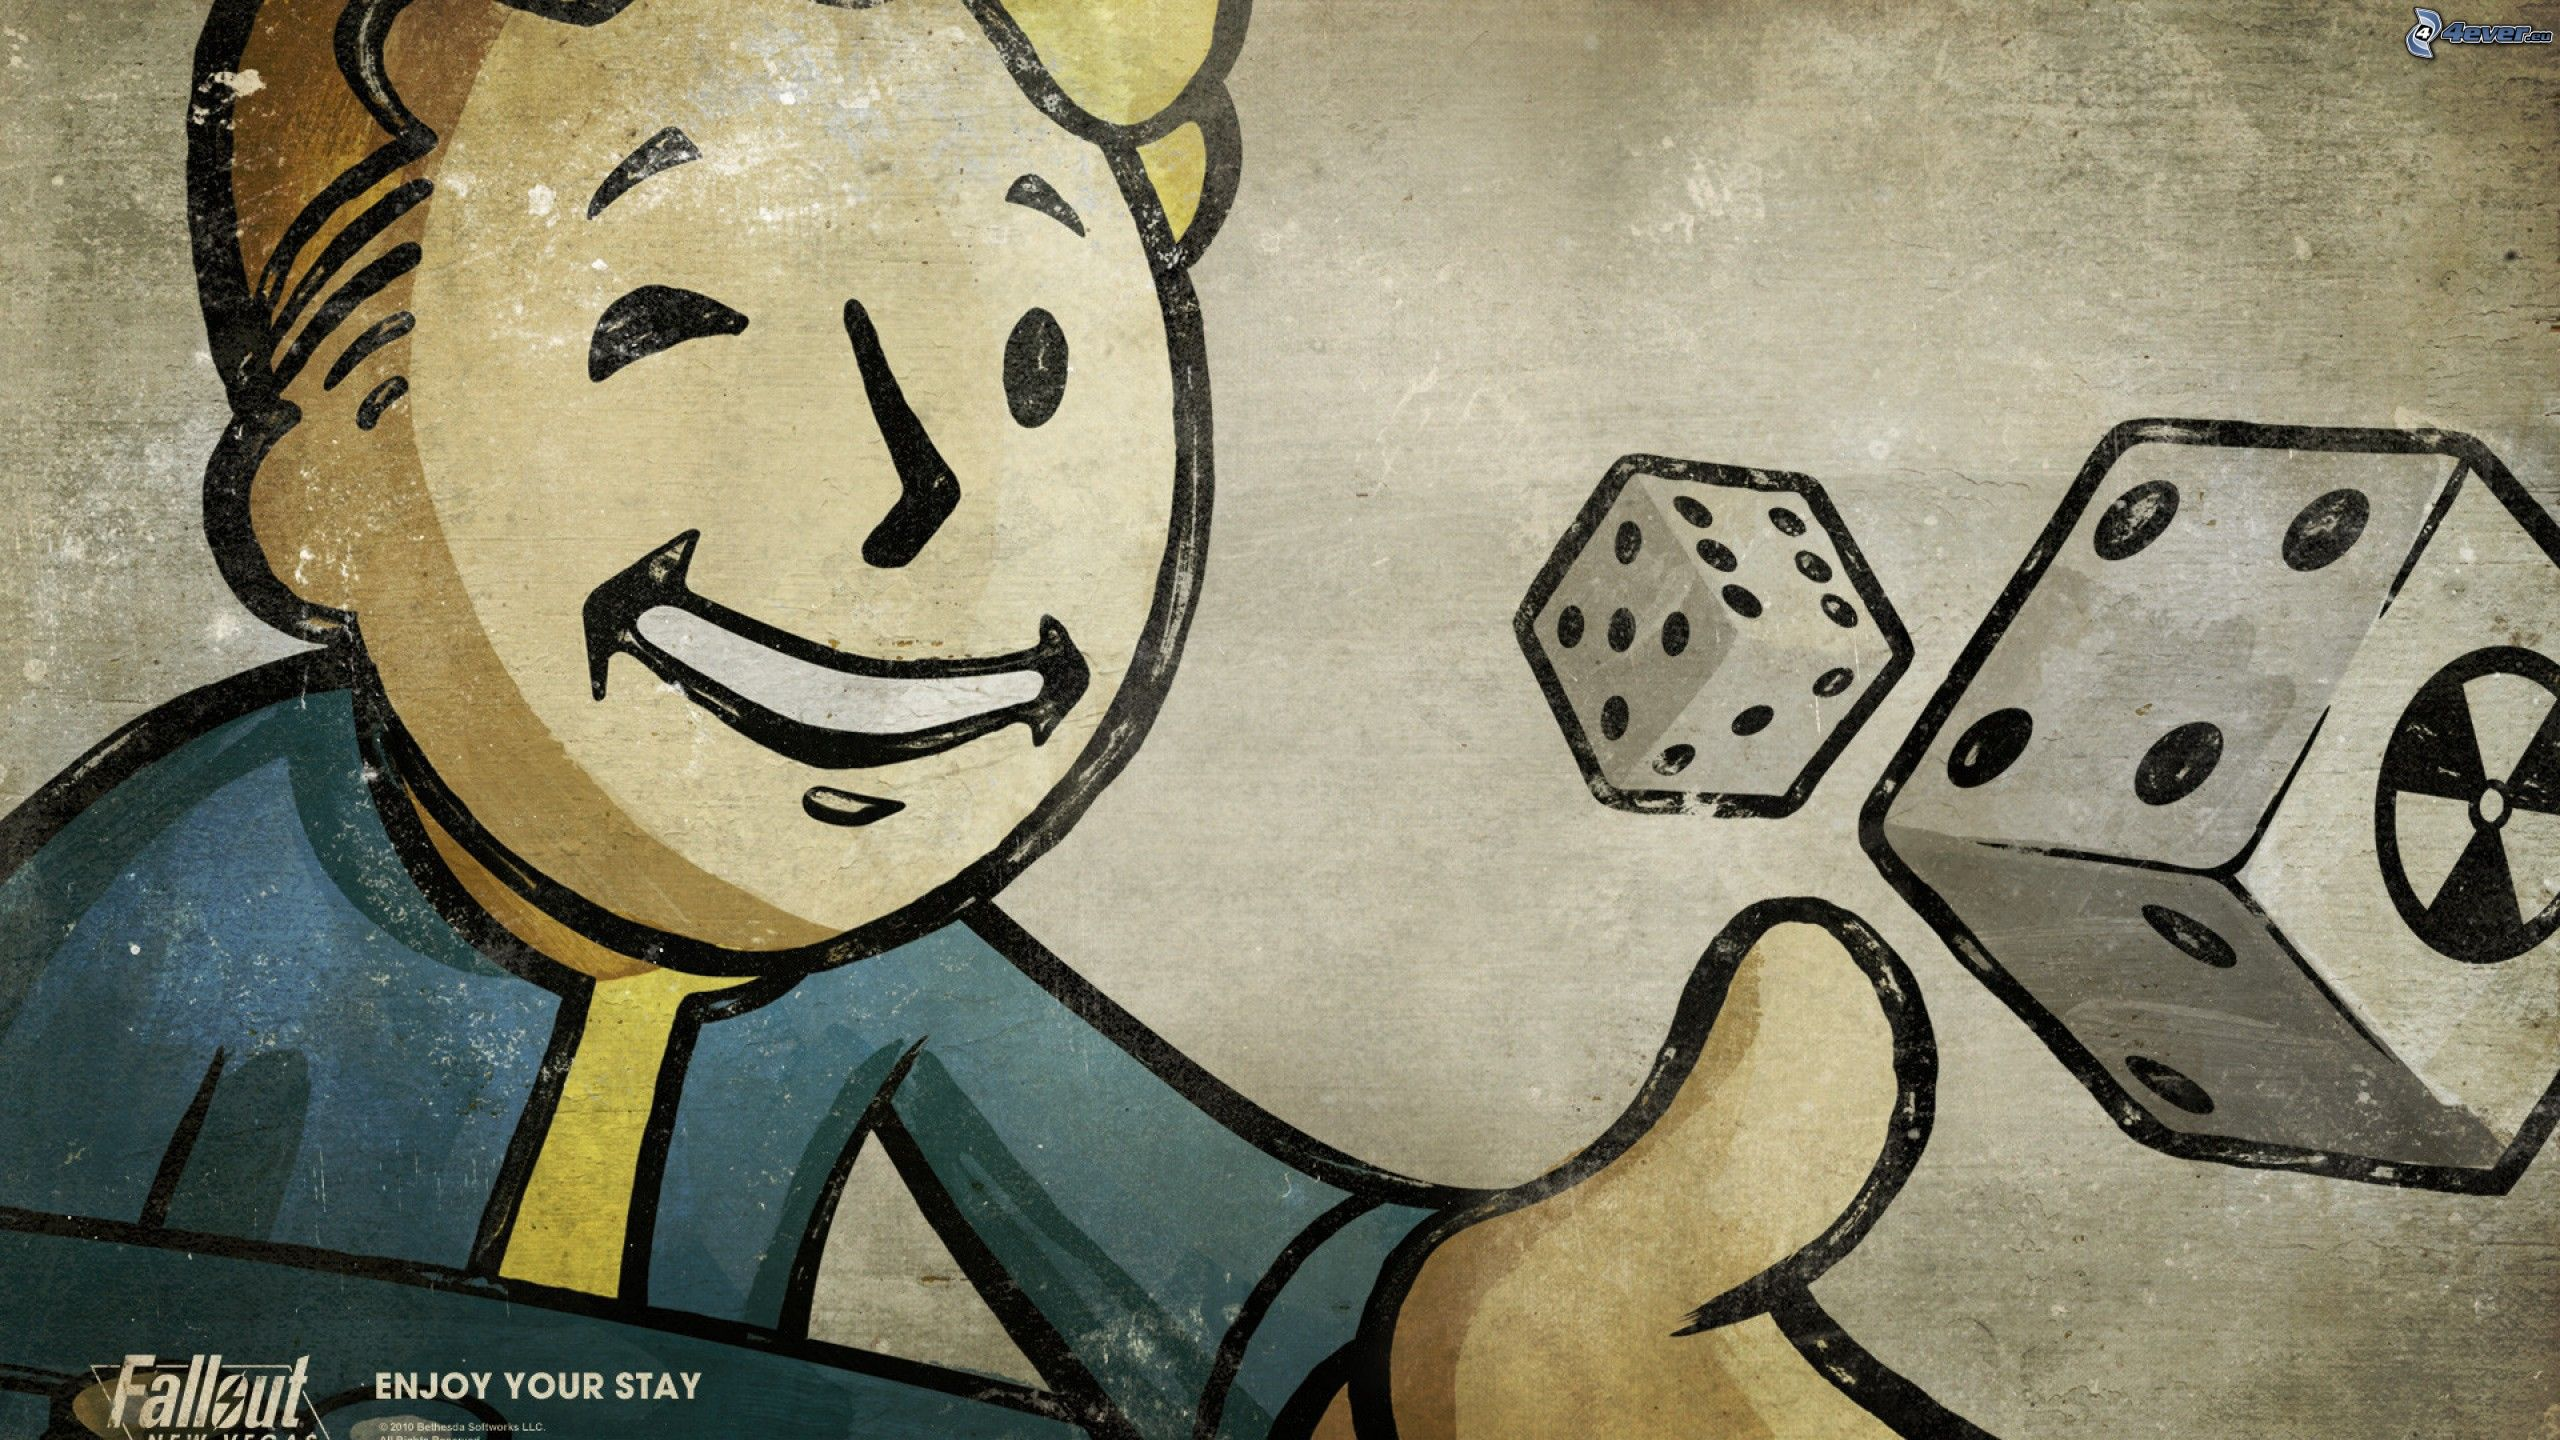 Fallout New Vegas Cartoon Fallout New Vegas Cartoon